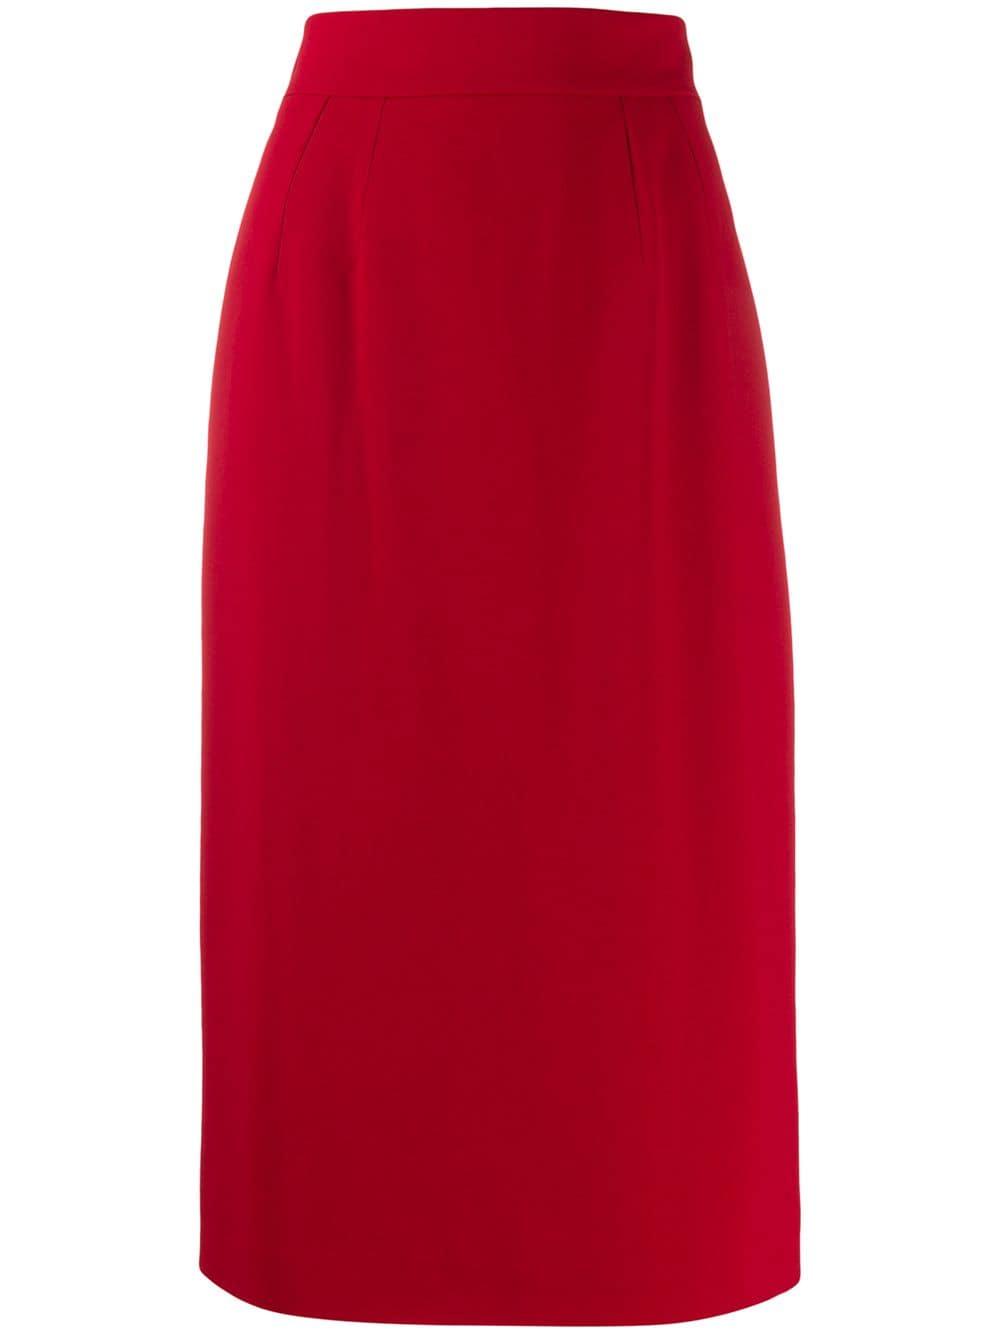 Dolce & Gabbana high-waisted pencil skirt